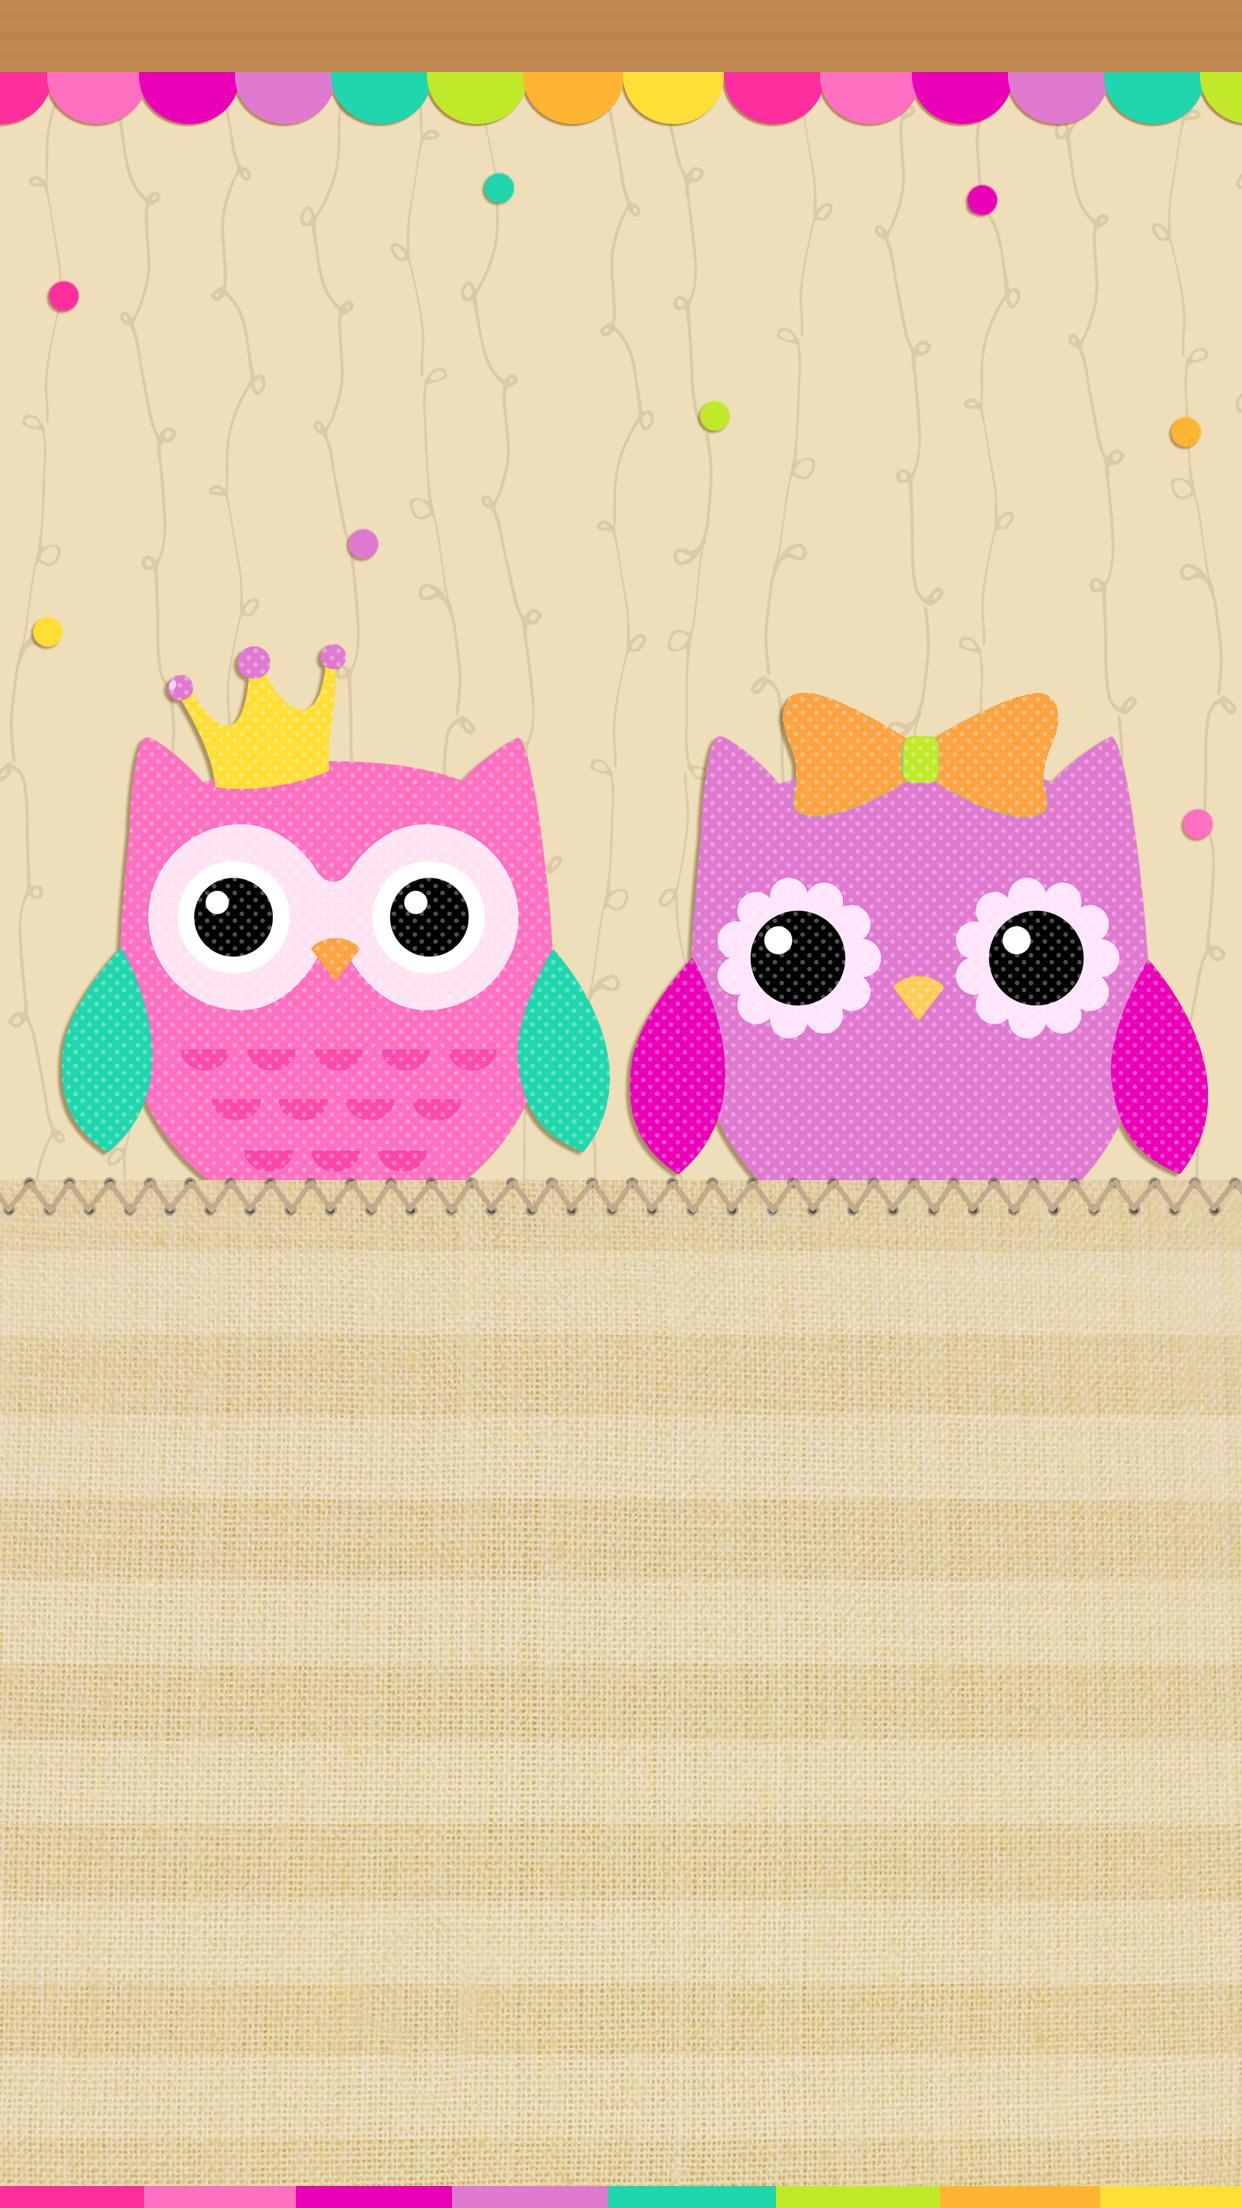 1920x1080 Owl Wallpaper Backgrounds Hd